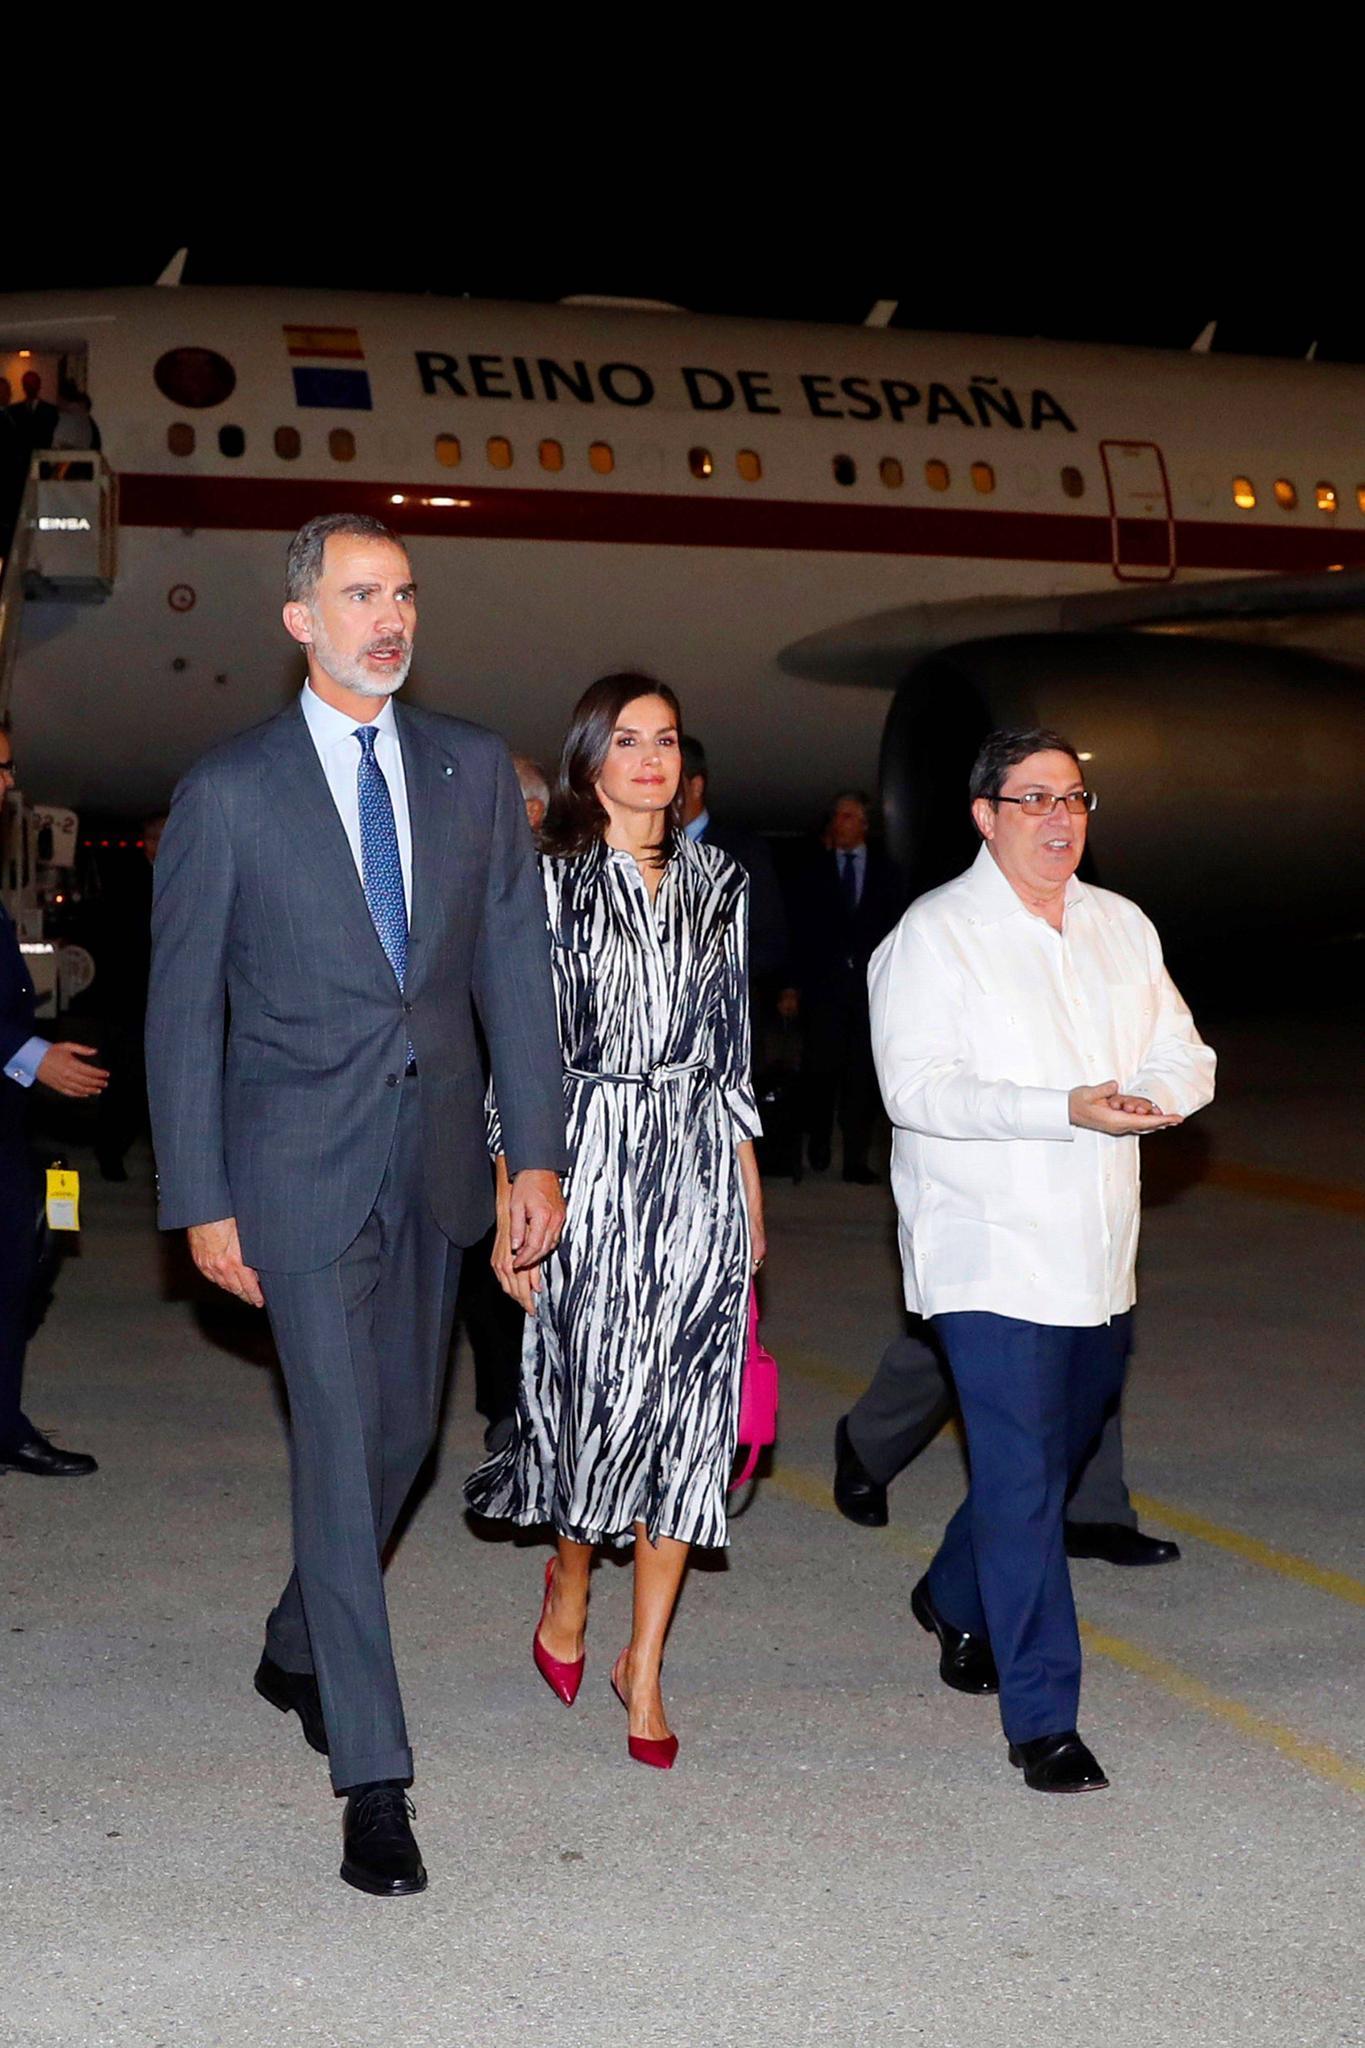 Stylishe Ankunft: So landeten Felipe und Letizia in Havanna.